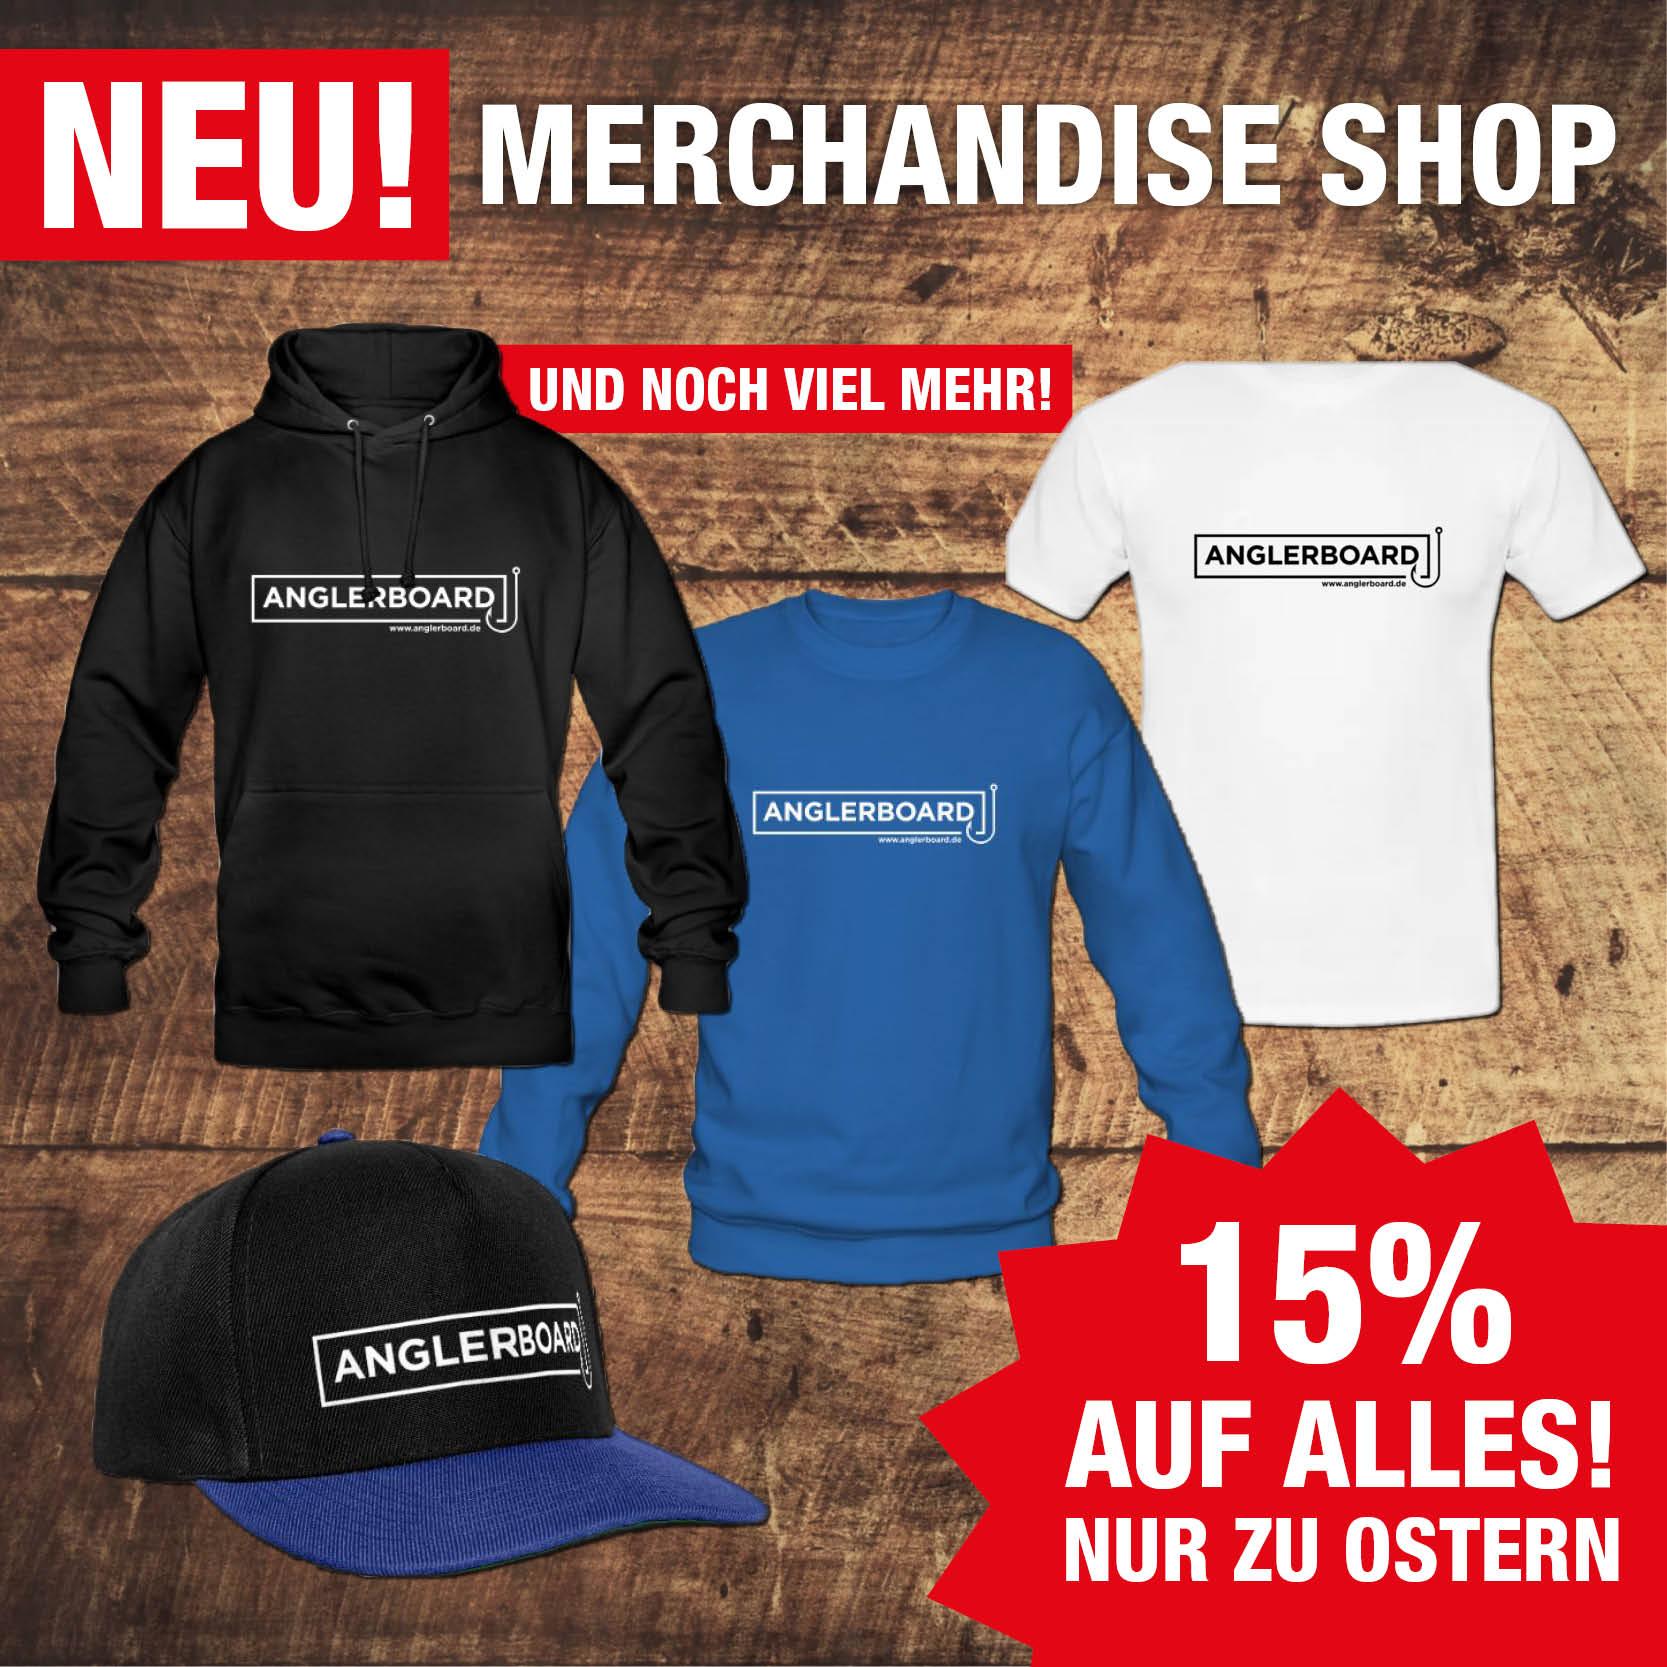 Anglerboard_FB-Quadrat_Merchandise shop.jpg